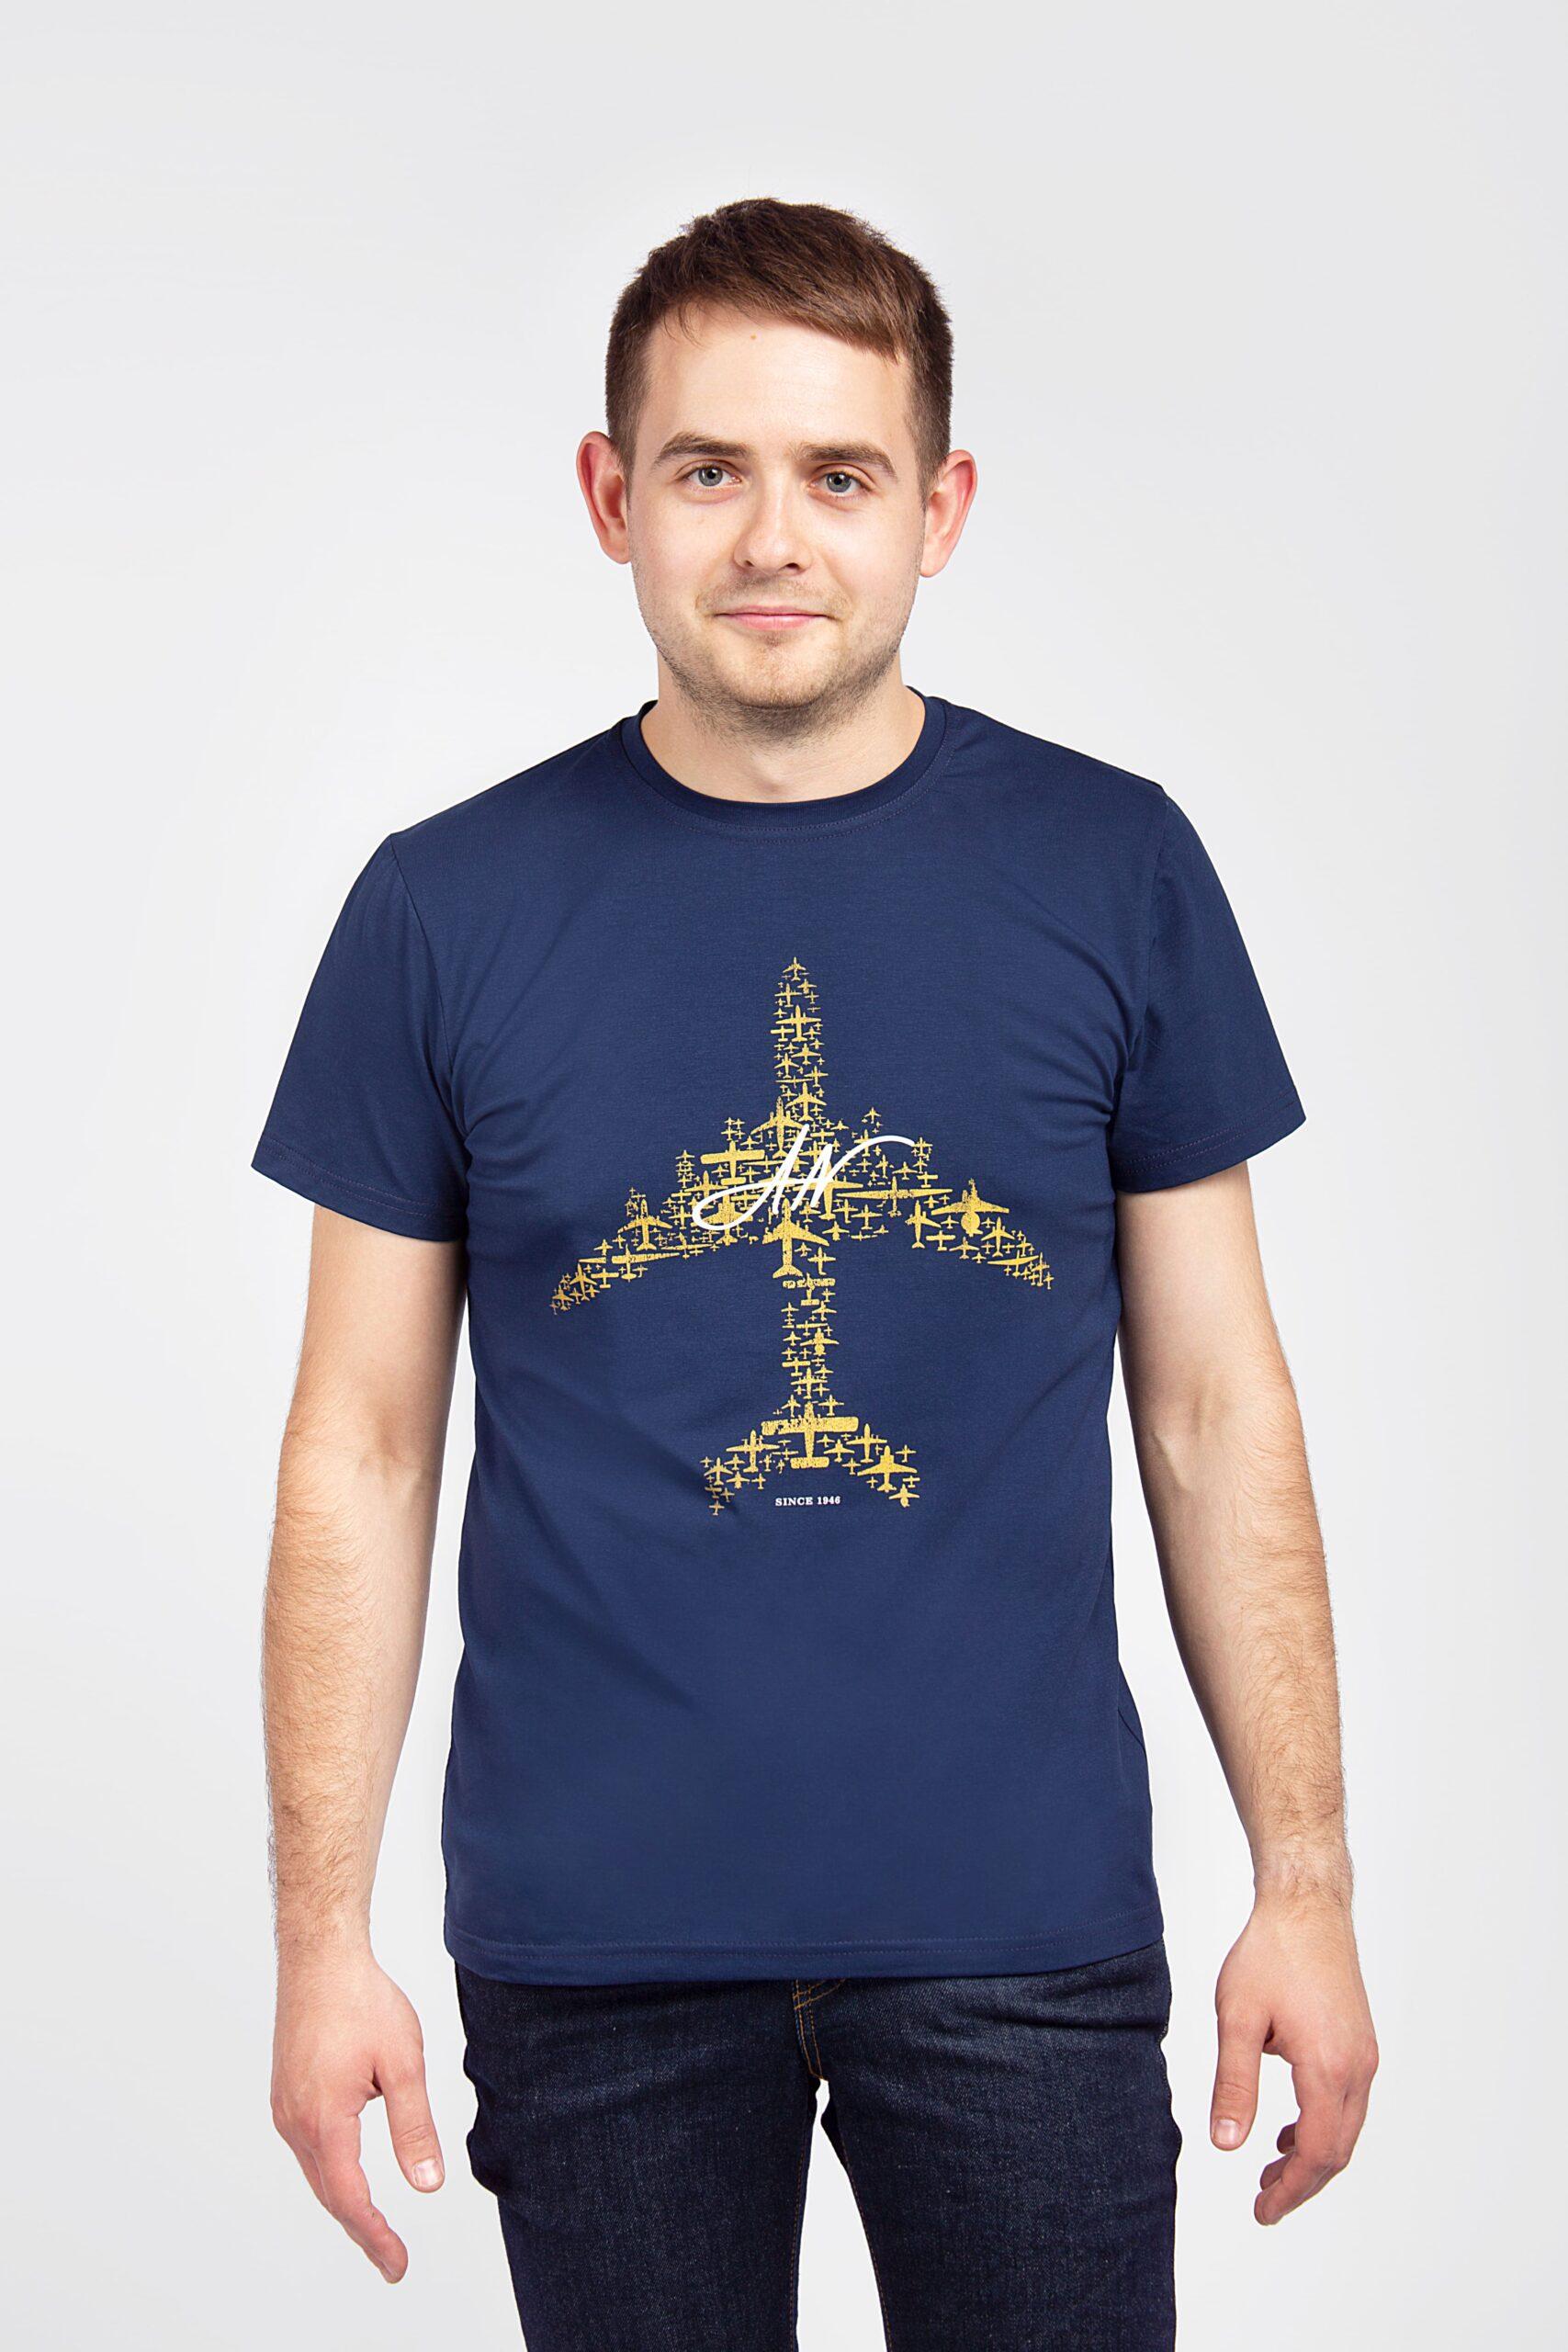 Men's T-Shirt An. The Greatest Hits. Color navy blue. Presale lasts till 10.